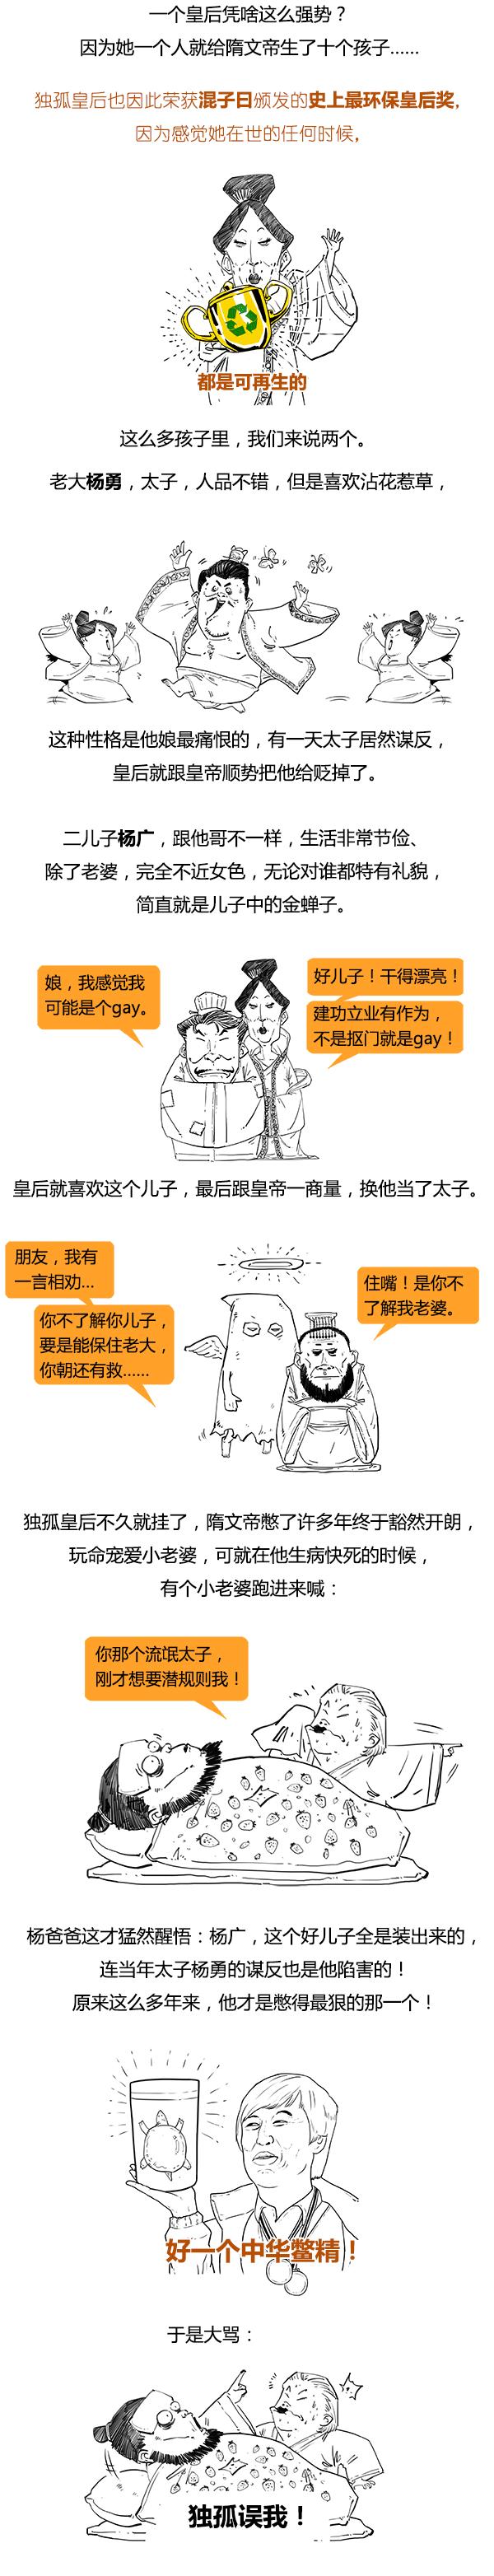 Stone历史剧-隋_03.png